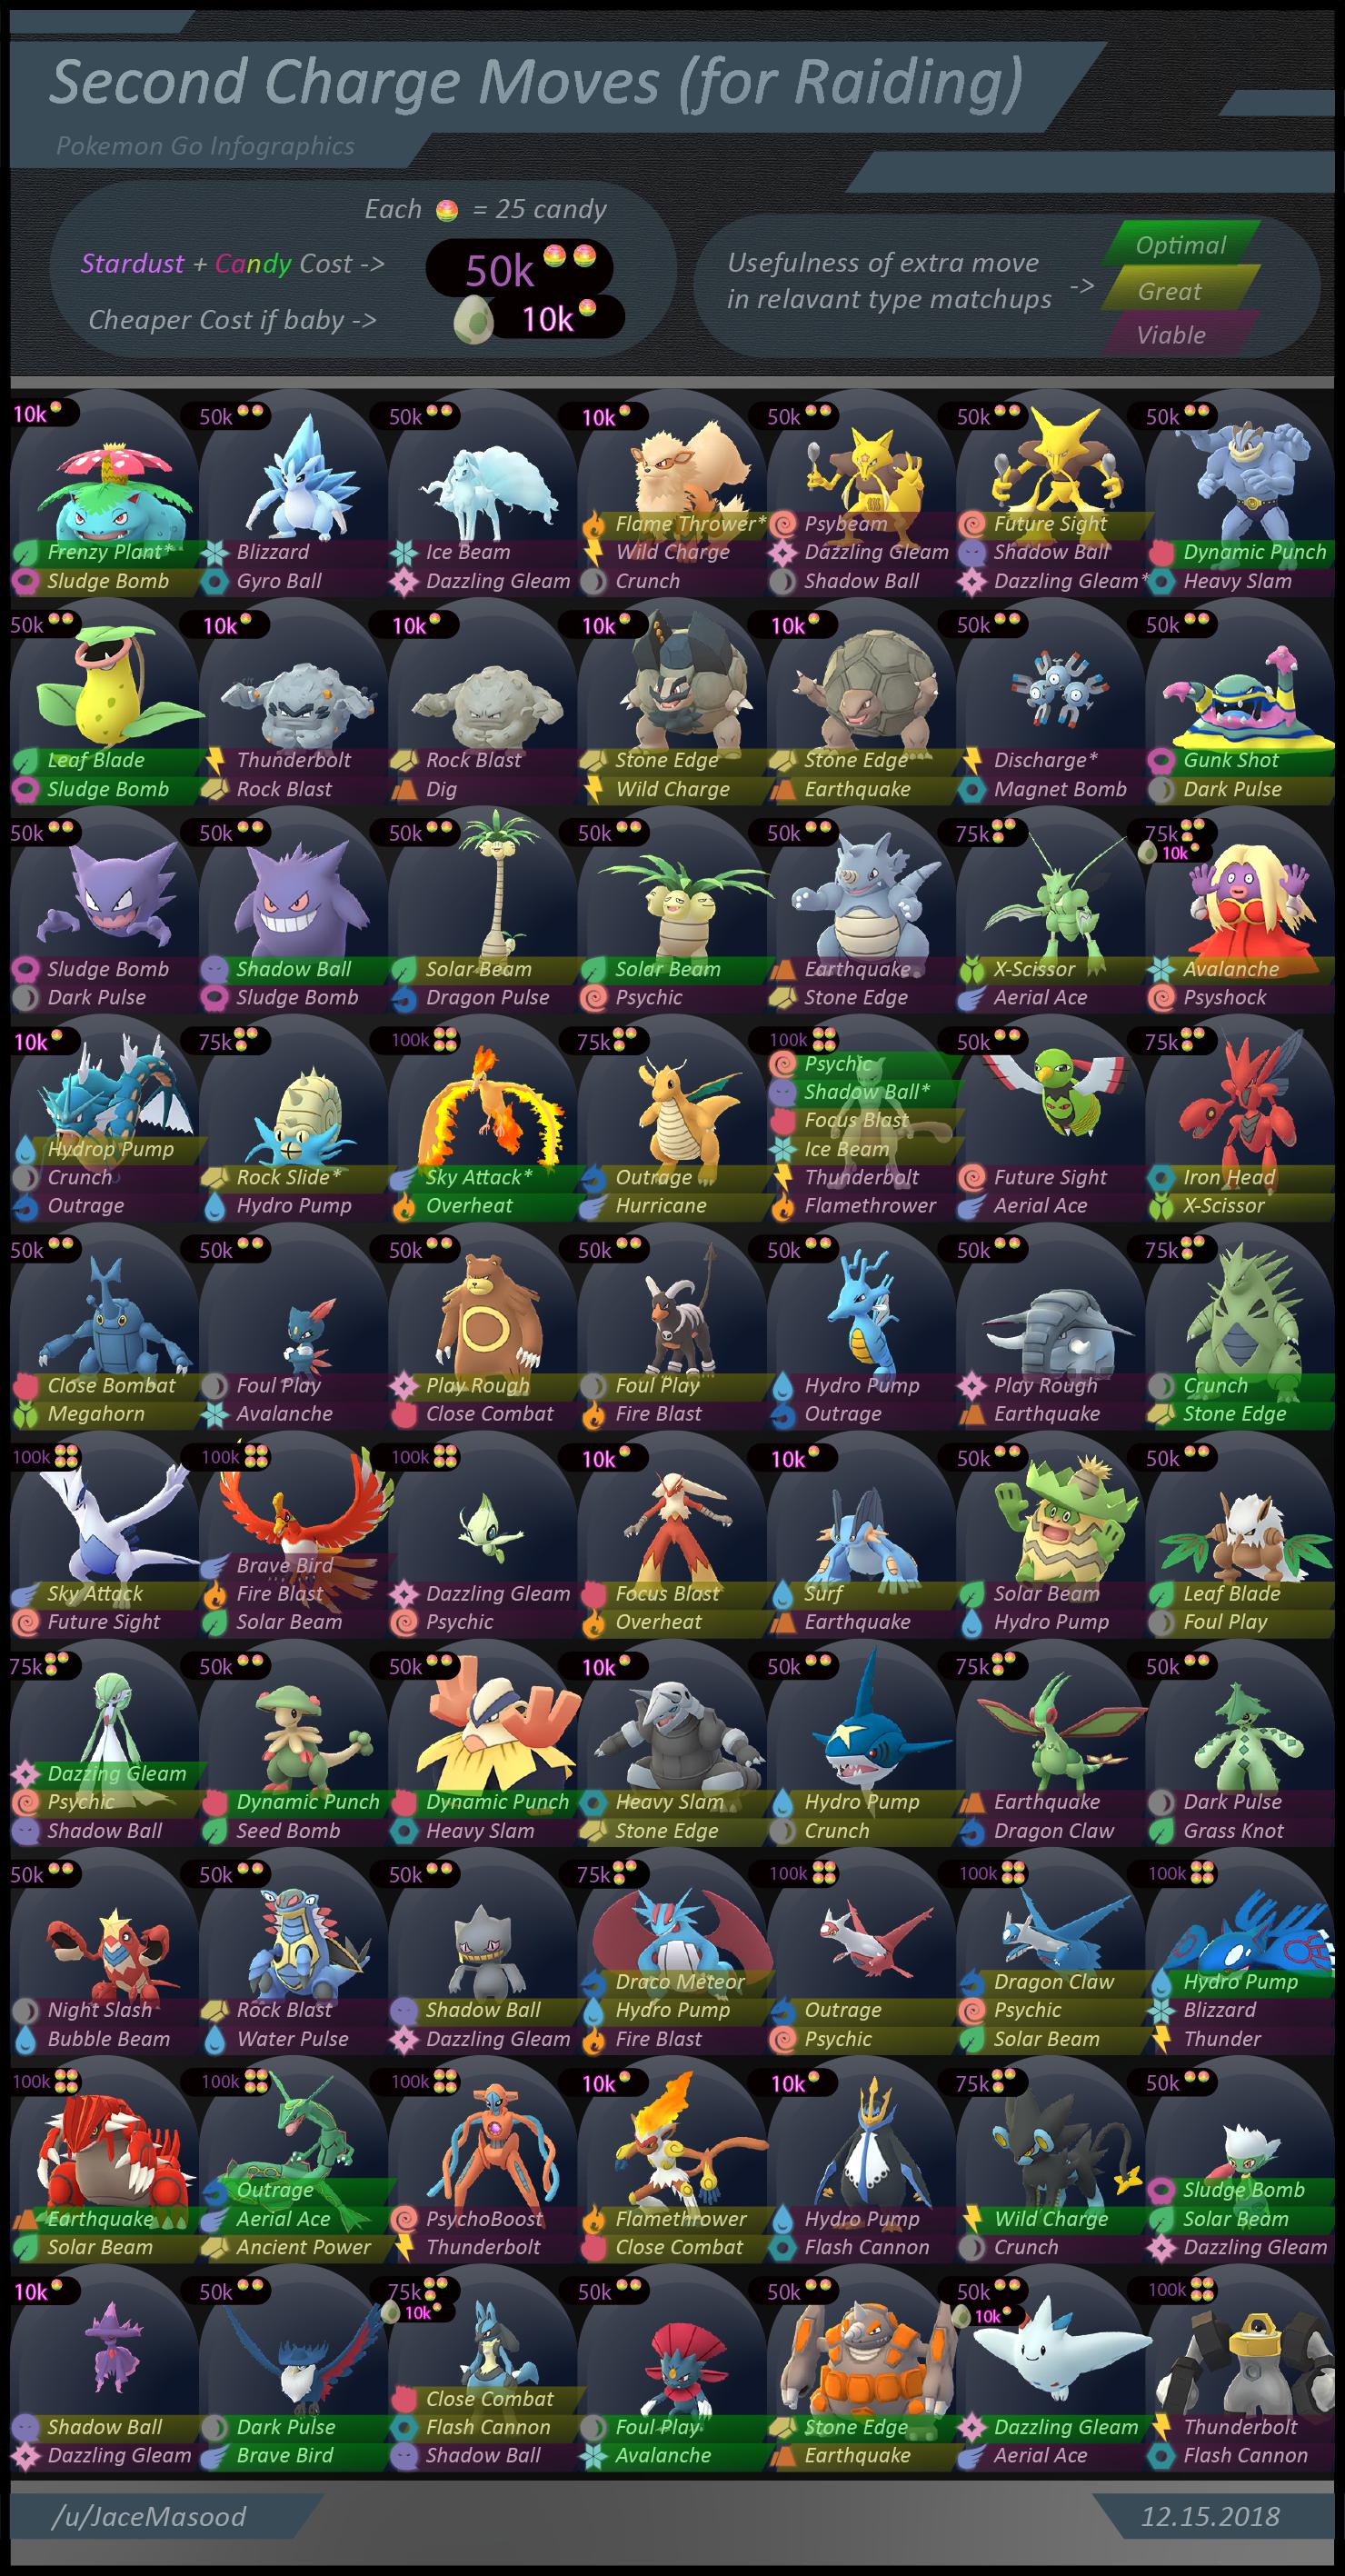 Second Charge Moves (for Raiding) | Pokémon GO | Pokemon